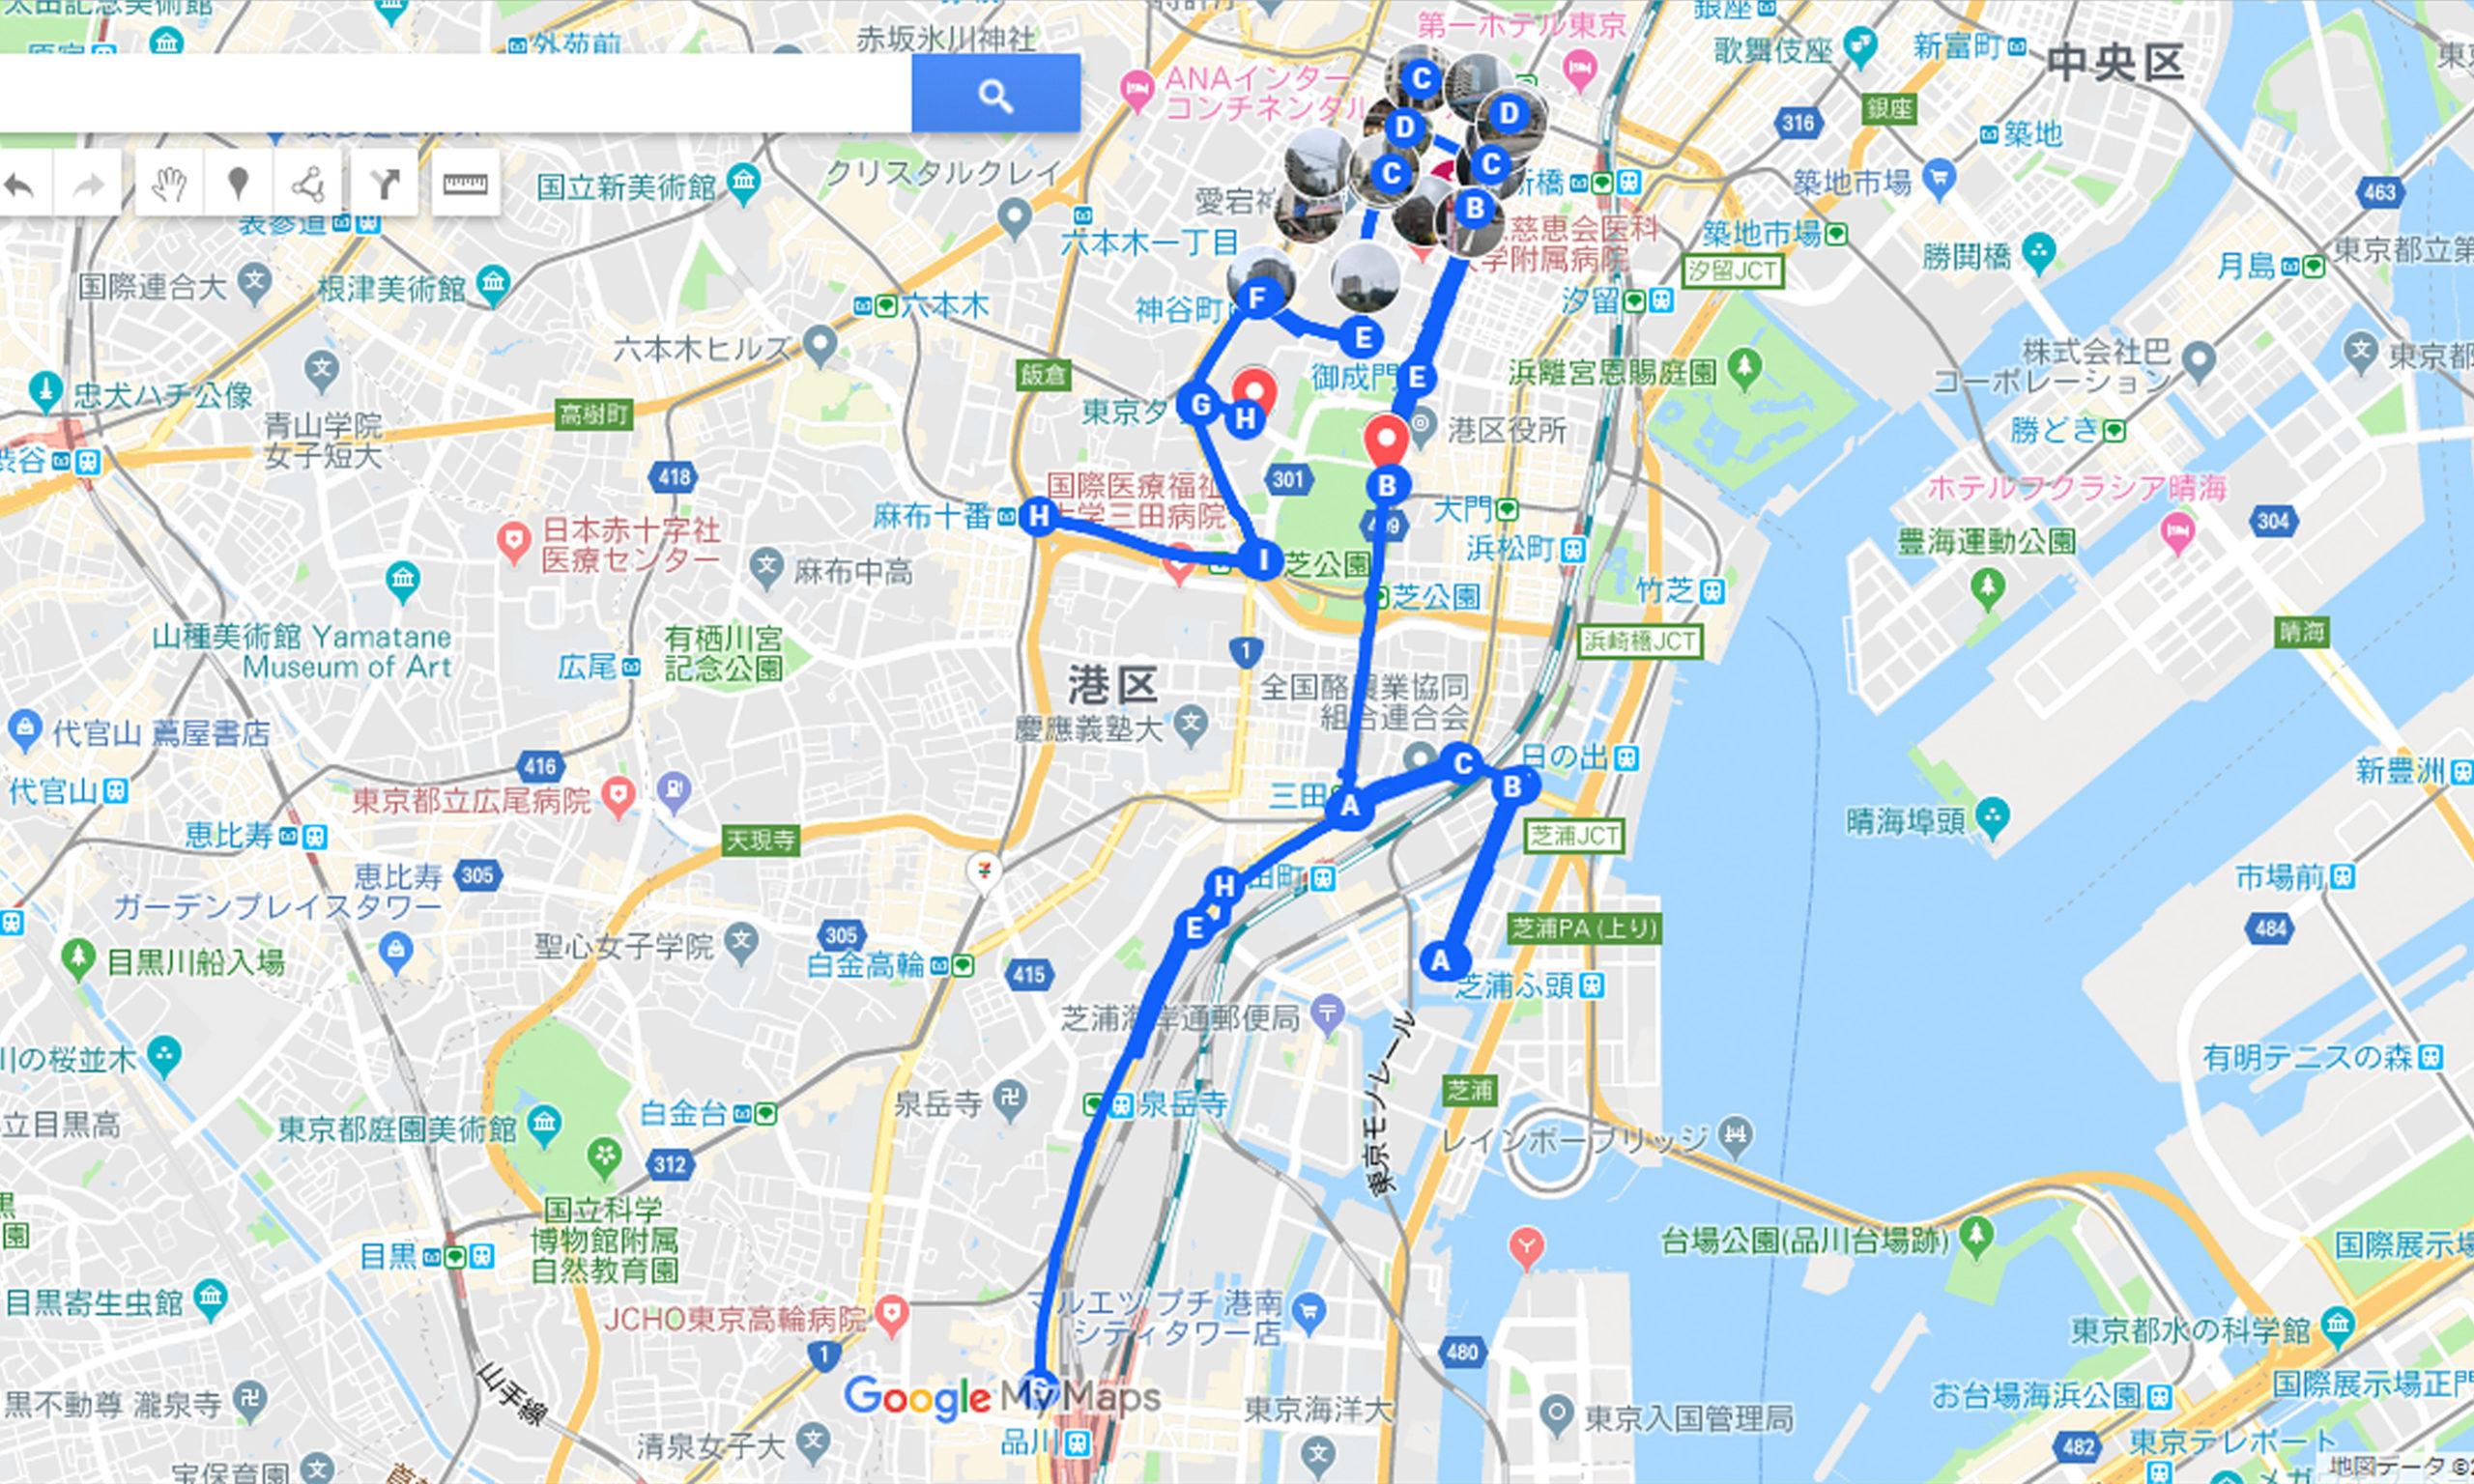 MINATO シティー ハーフ マラソン 大会 試走 マップ Map 地図 港区 ミナト MINATOシティハーフマラソン2018